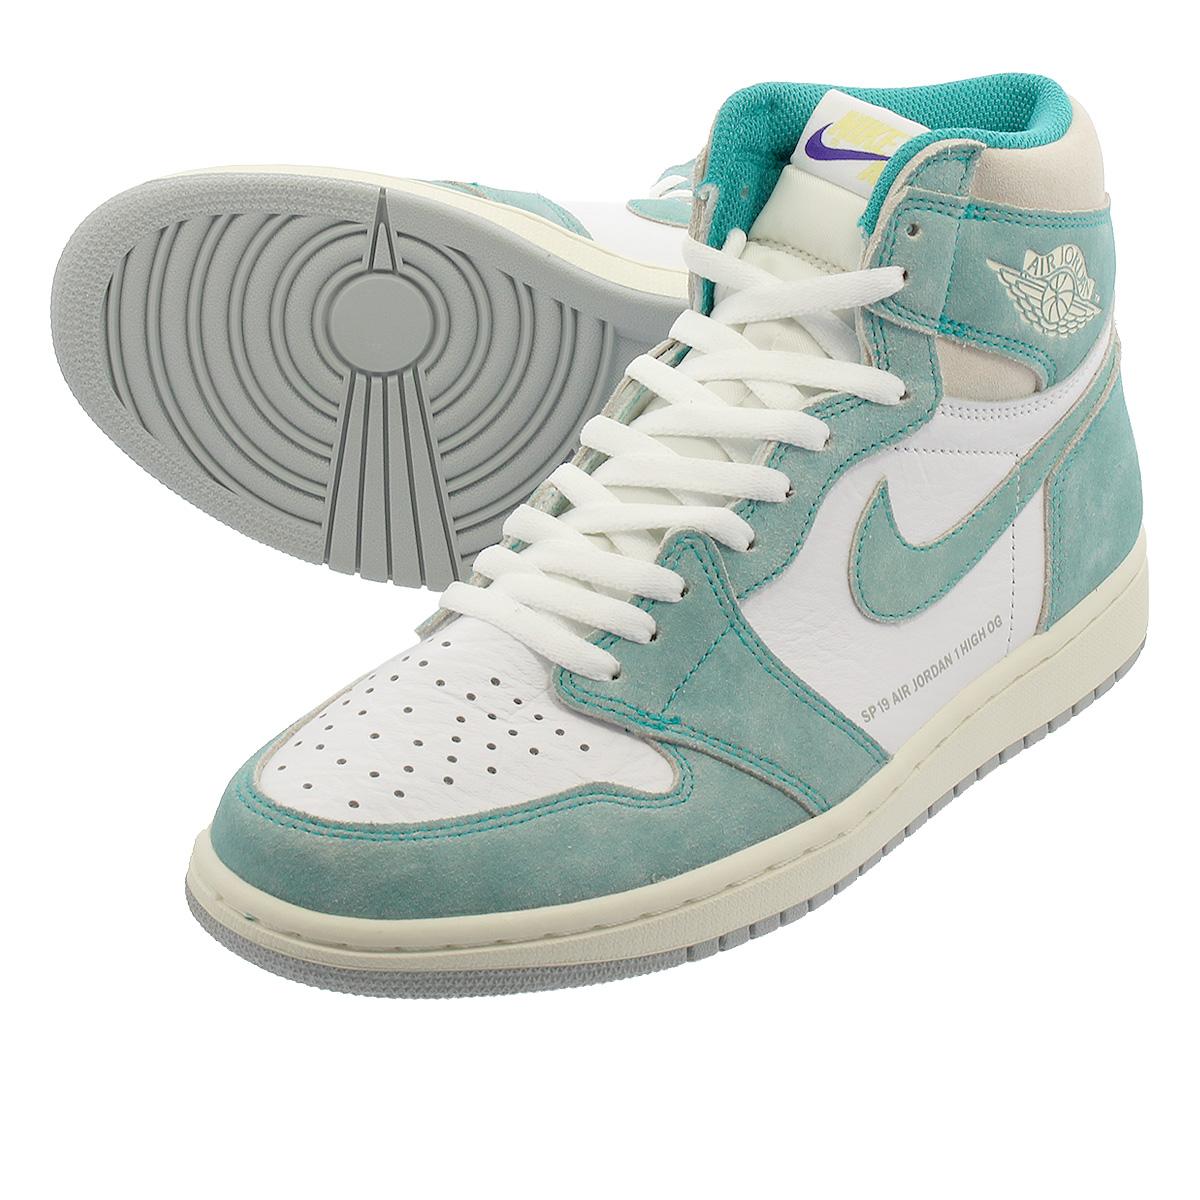 4a946b0ca69 NIKE AIR JORDAN 1 RETRO HIGH OG Nike Air Jordan 1 nostalgic high OG TURBO  GREEN WHITE SAIL LIGHT SMOKE GREY 555